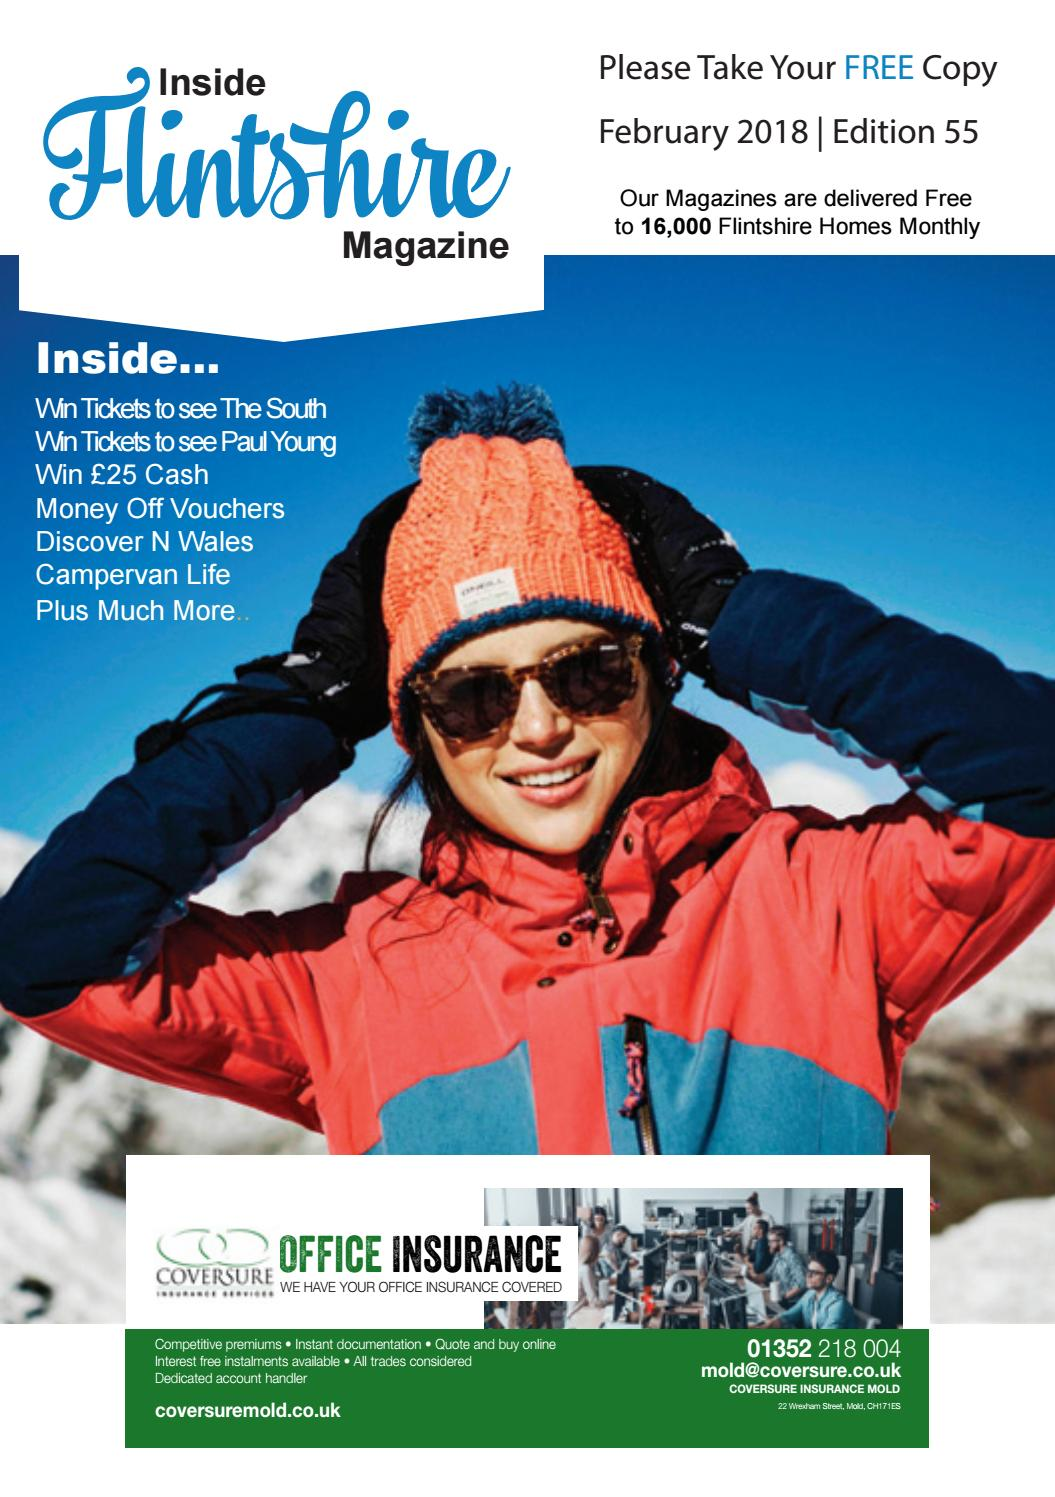 Inside Flintshire Magazine February 2018 by Inside Flintshire